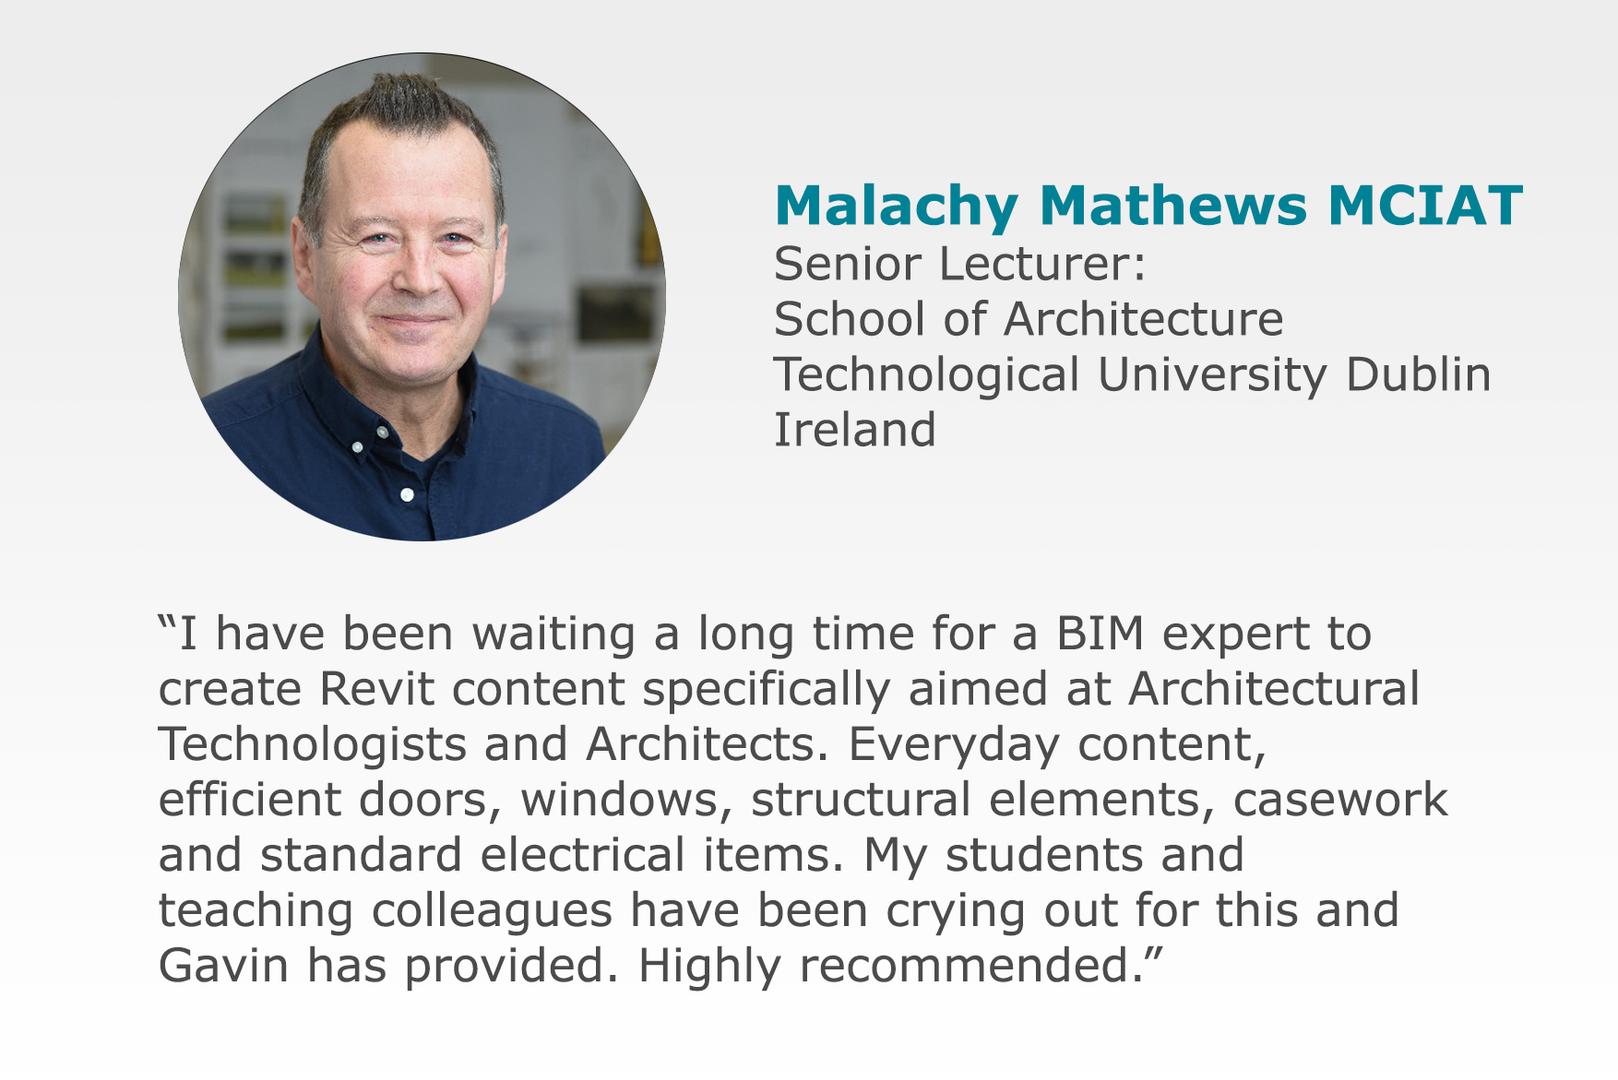 Malachy Mathews